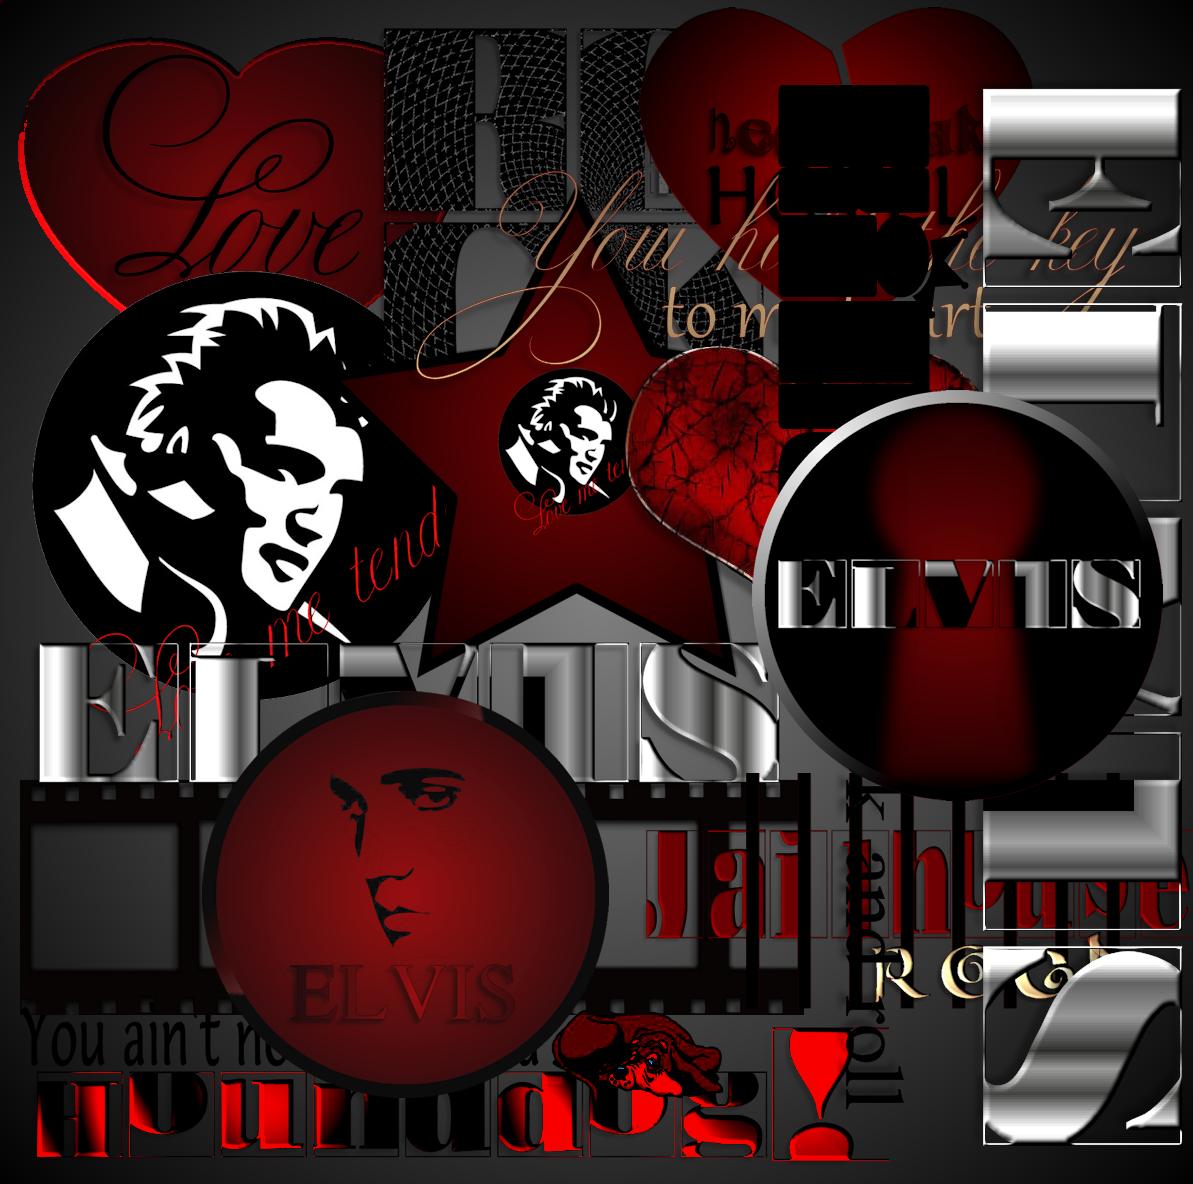 http://2.bp.blogspot.com/-zYM1P3em2BI/UysskhbkhkI/AAAAAAAAEdA/kAKUiXQzknQ/s1600/Elvis_wordart_rainy.png